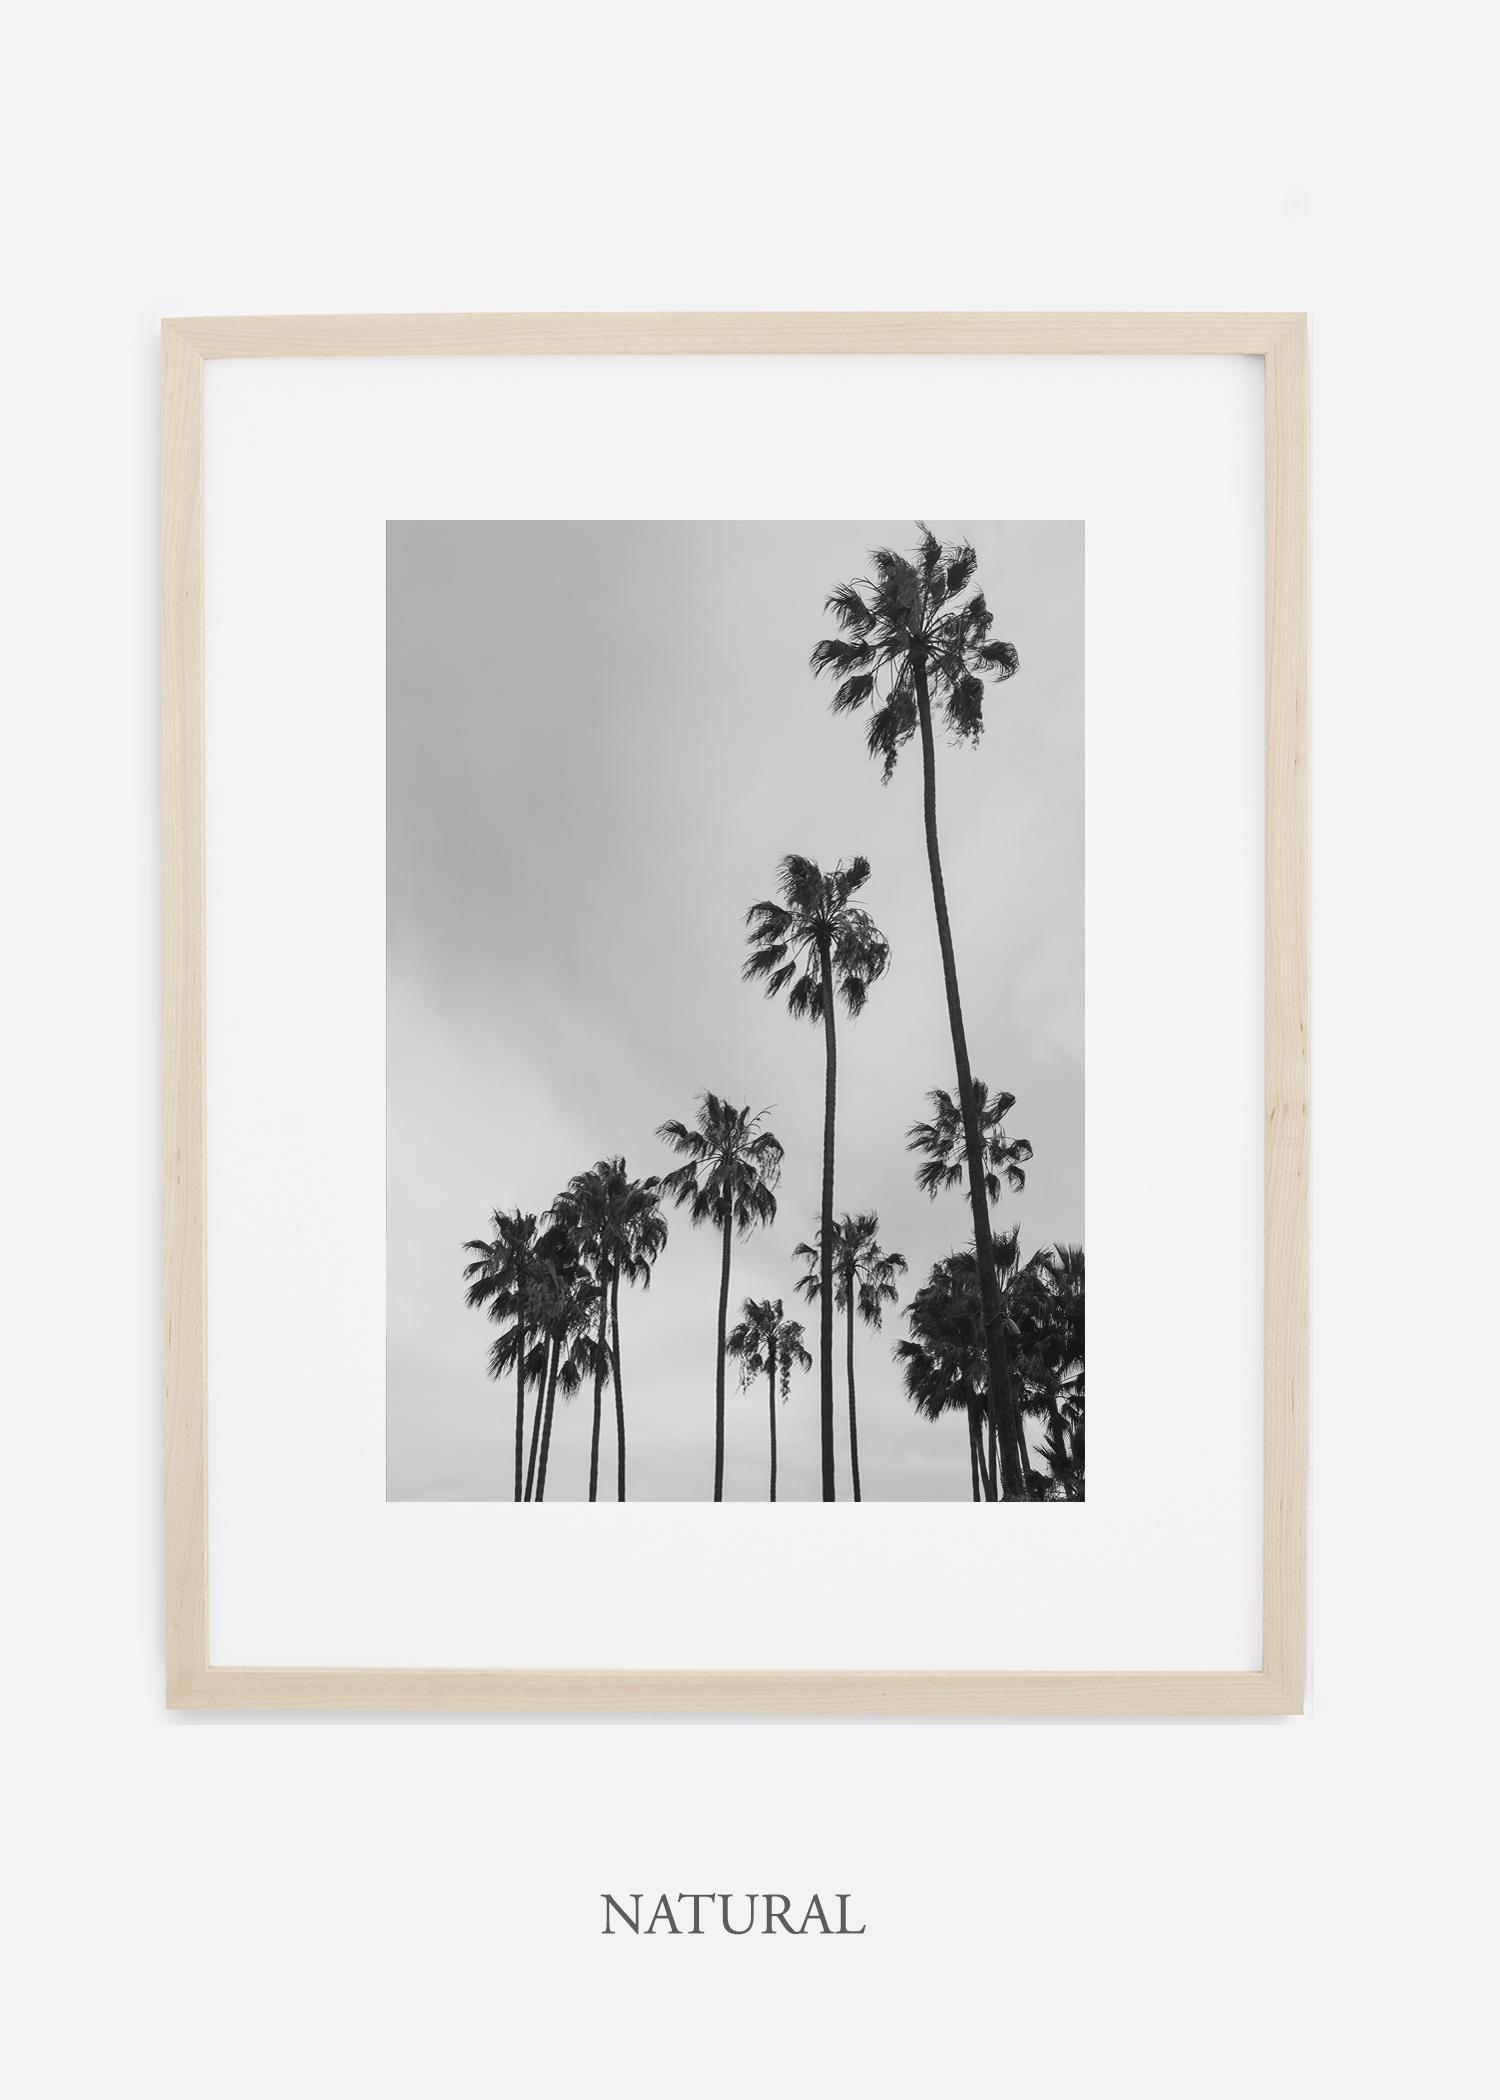 interiordesign_california_losangeles_palmtree_naturalframe.jpg